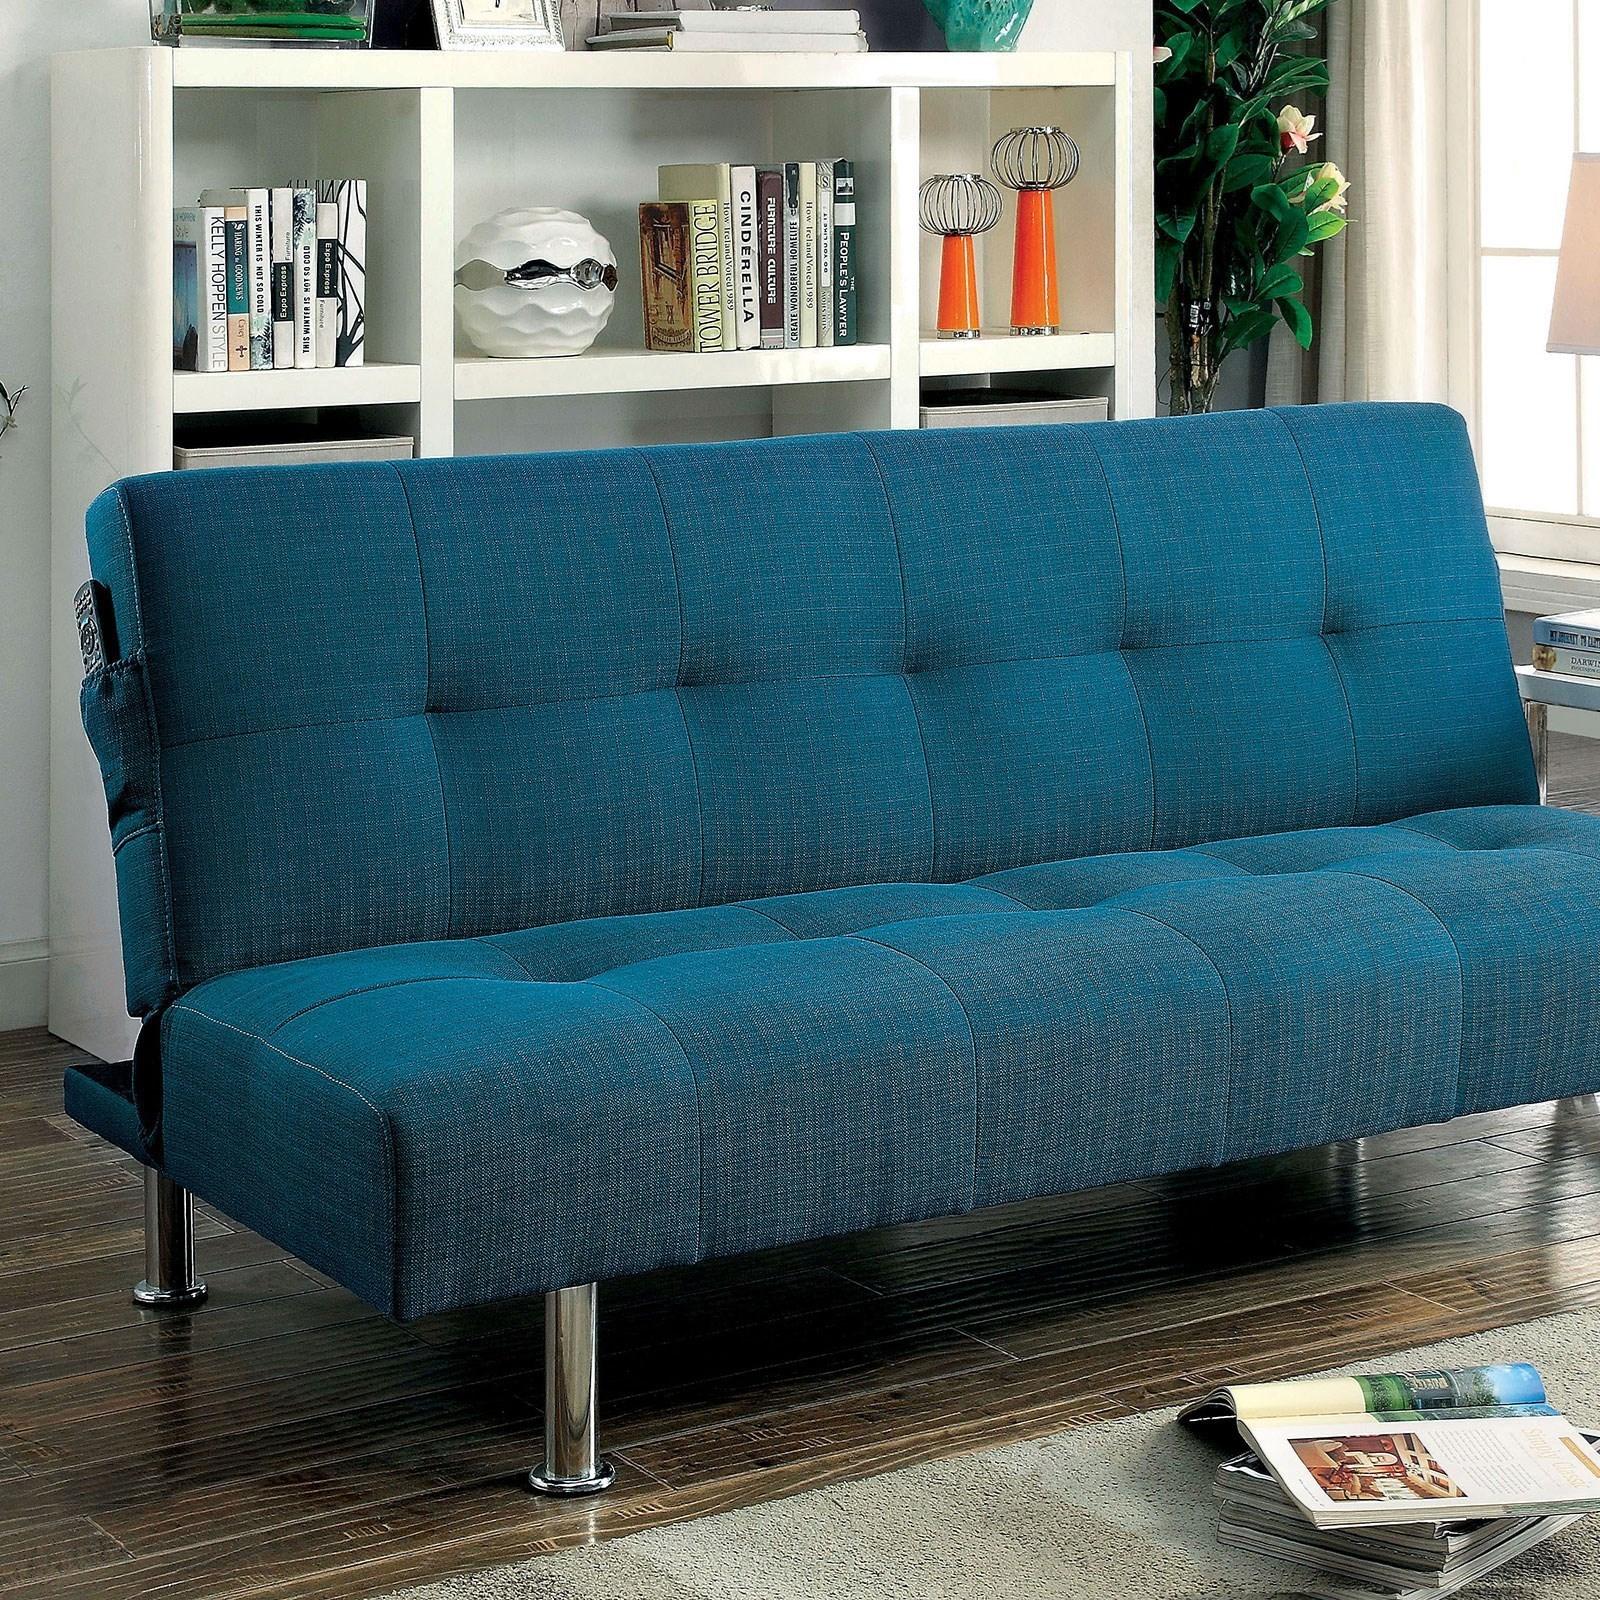 Dewey Futon Sofa by Furniture of America at Dream Home Interiors